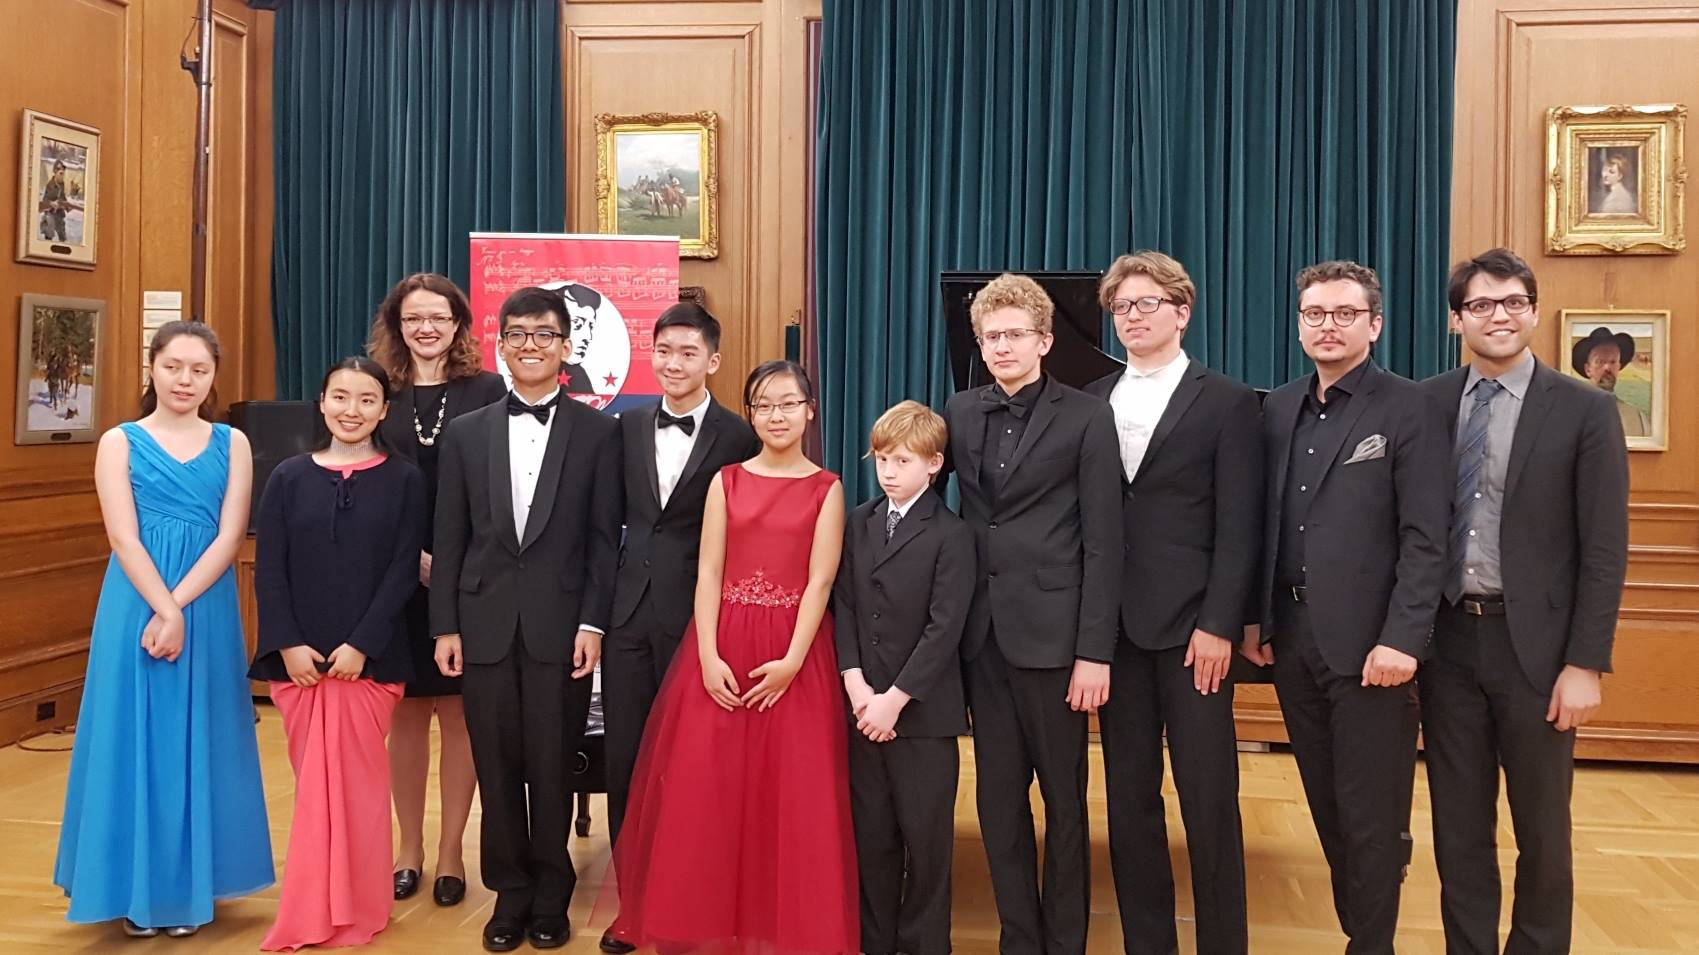 Winners Concert At Kosciuszko Foundation New York CIty